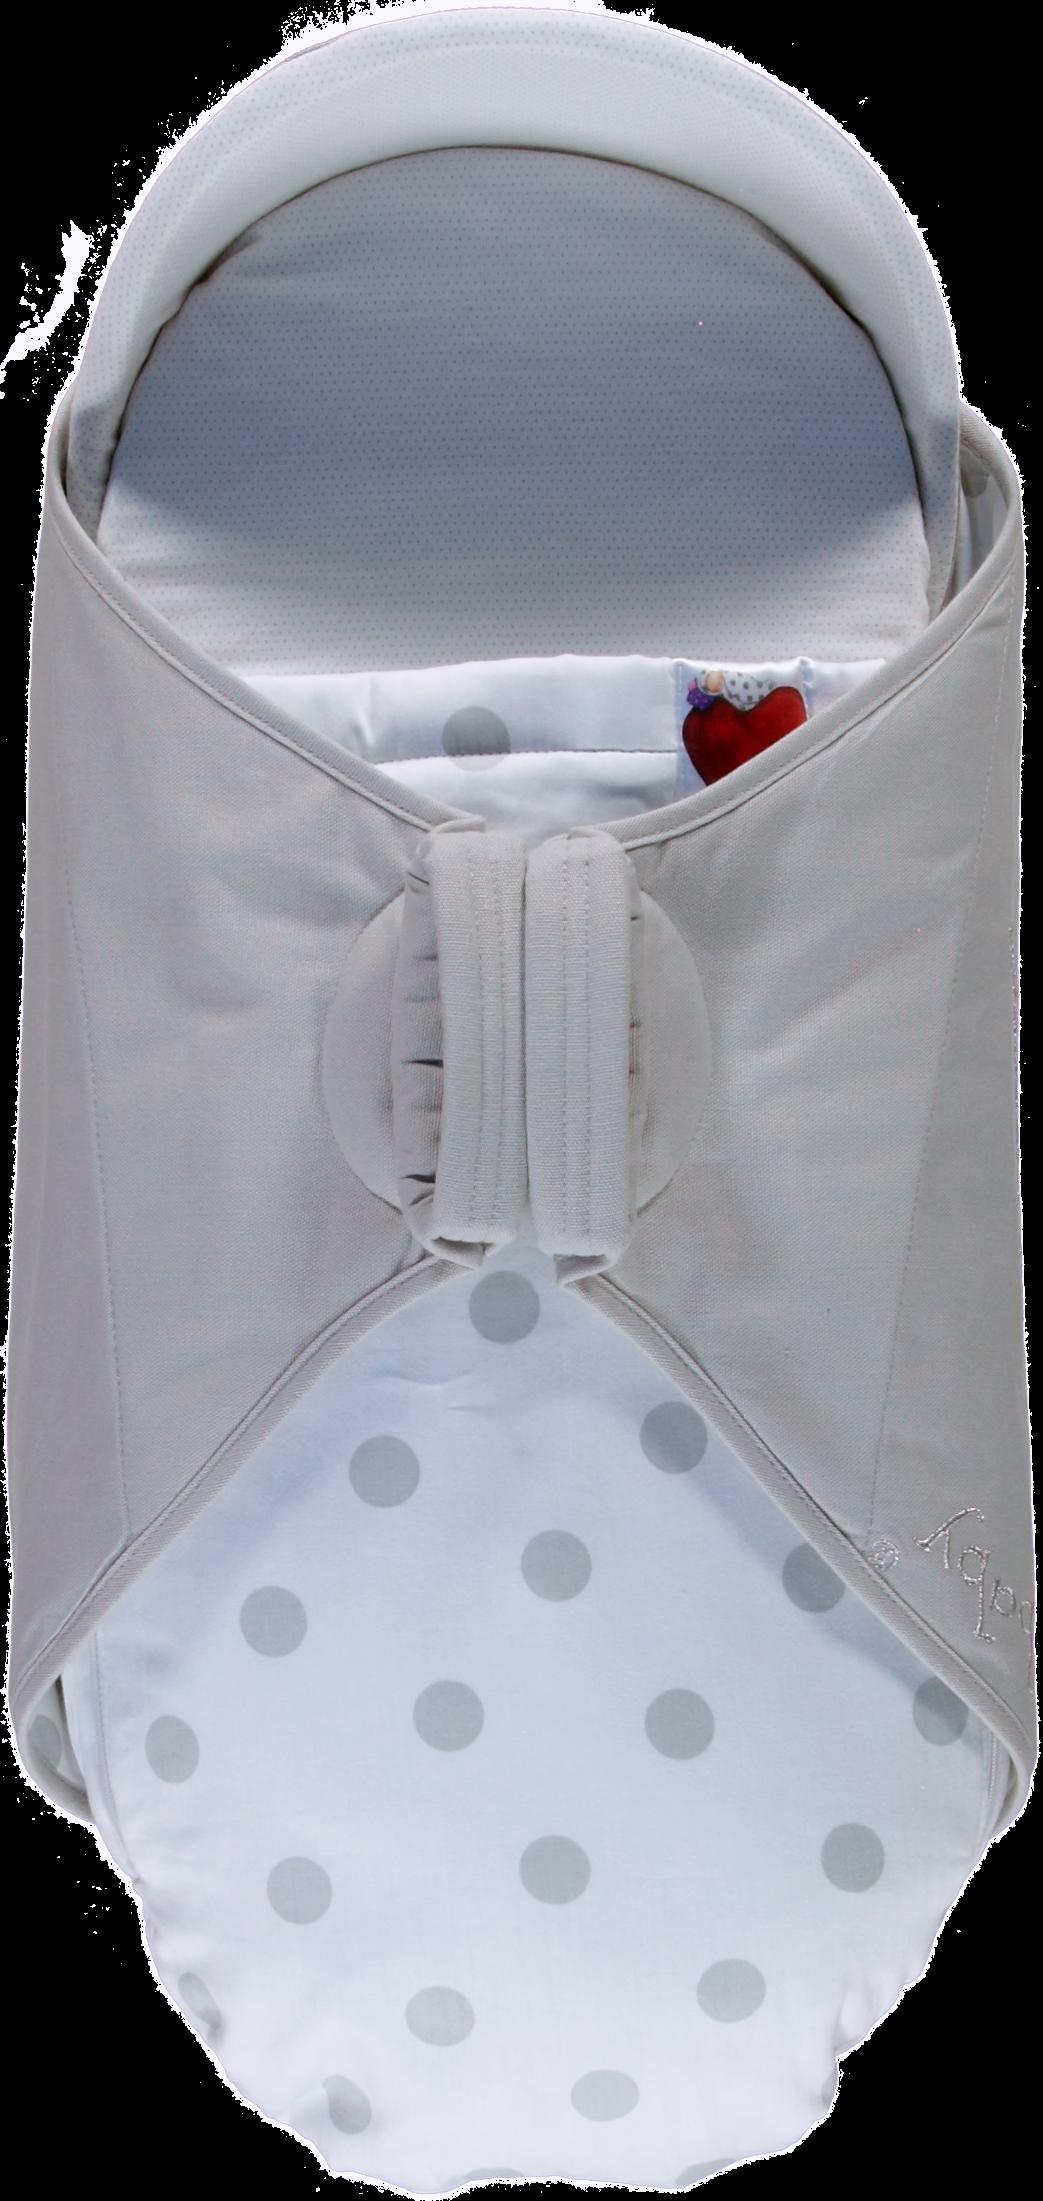 puckababy babywiege sleeper neu ebay. Black Bedroom Furniture Sets. Home Design Ideas